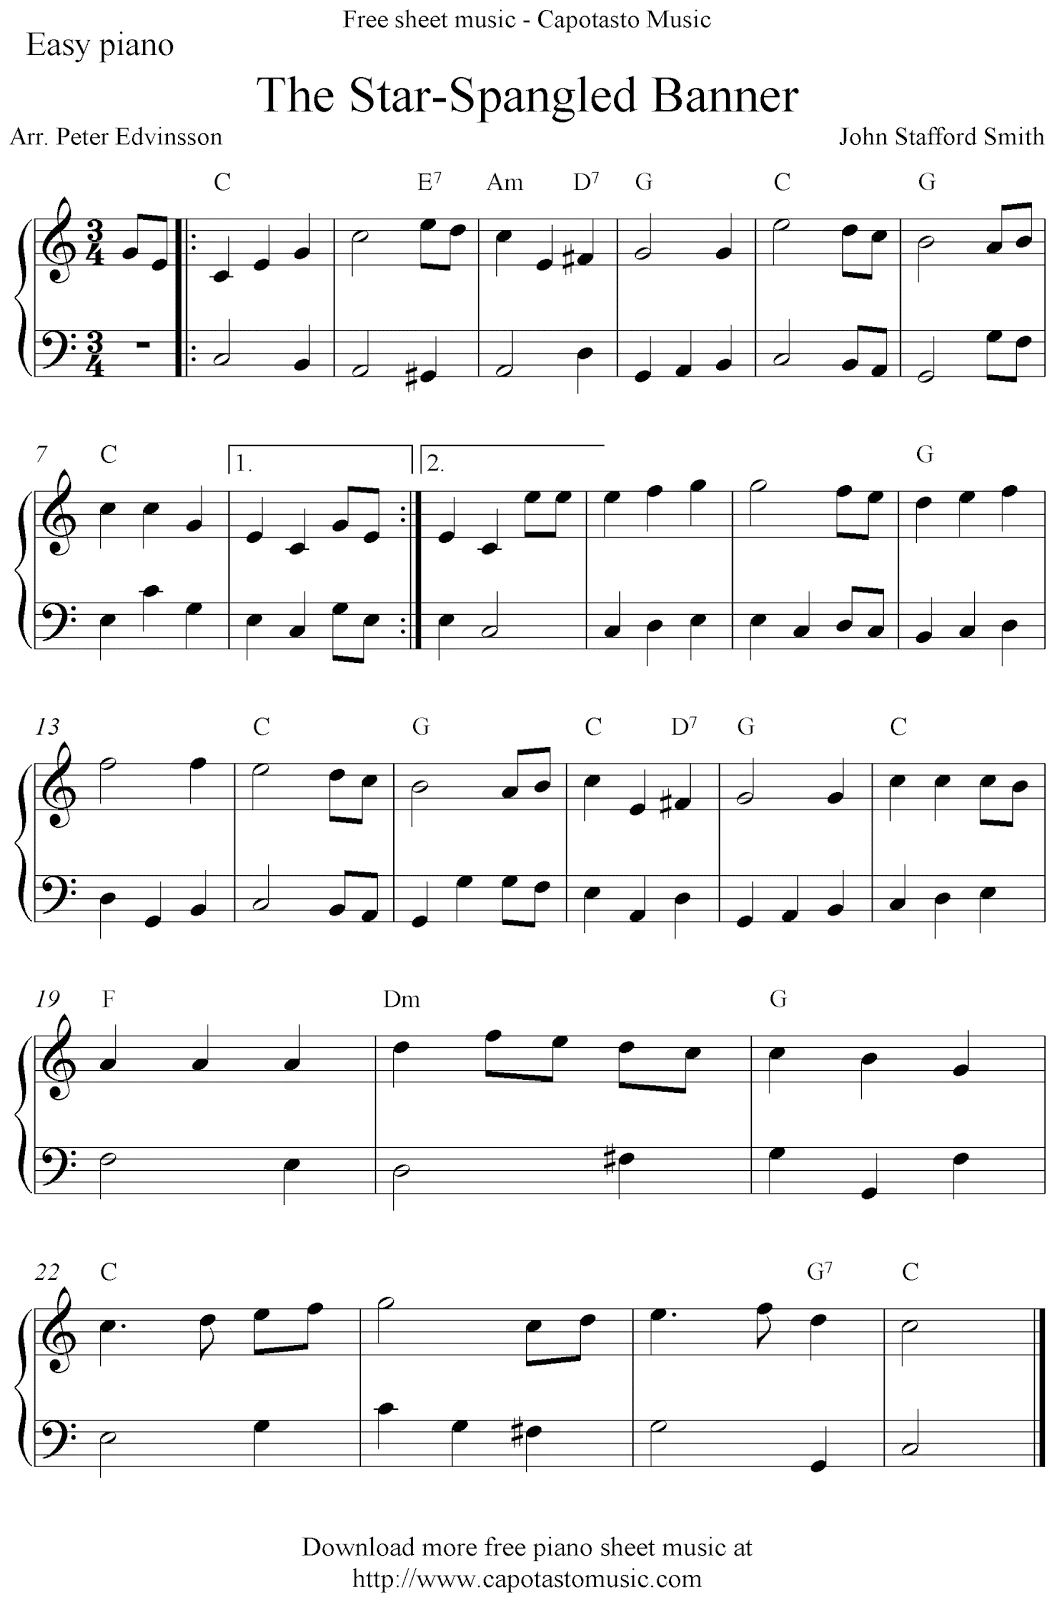 Free Easy Piano Sheet Music Score, The Star-Spangled Banner - Free Printable Piano Sheet Music For The Star Spangled Banner